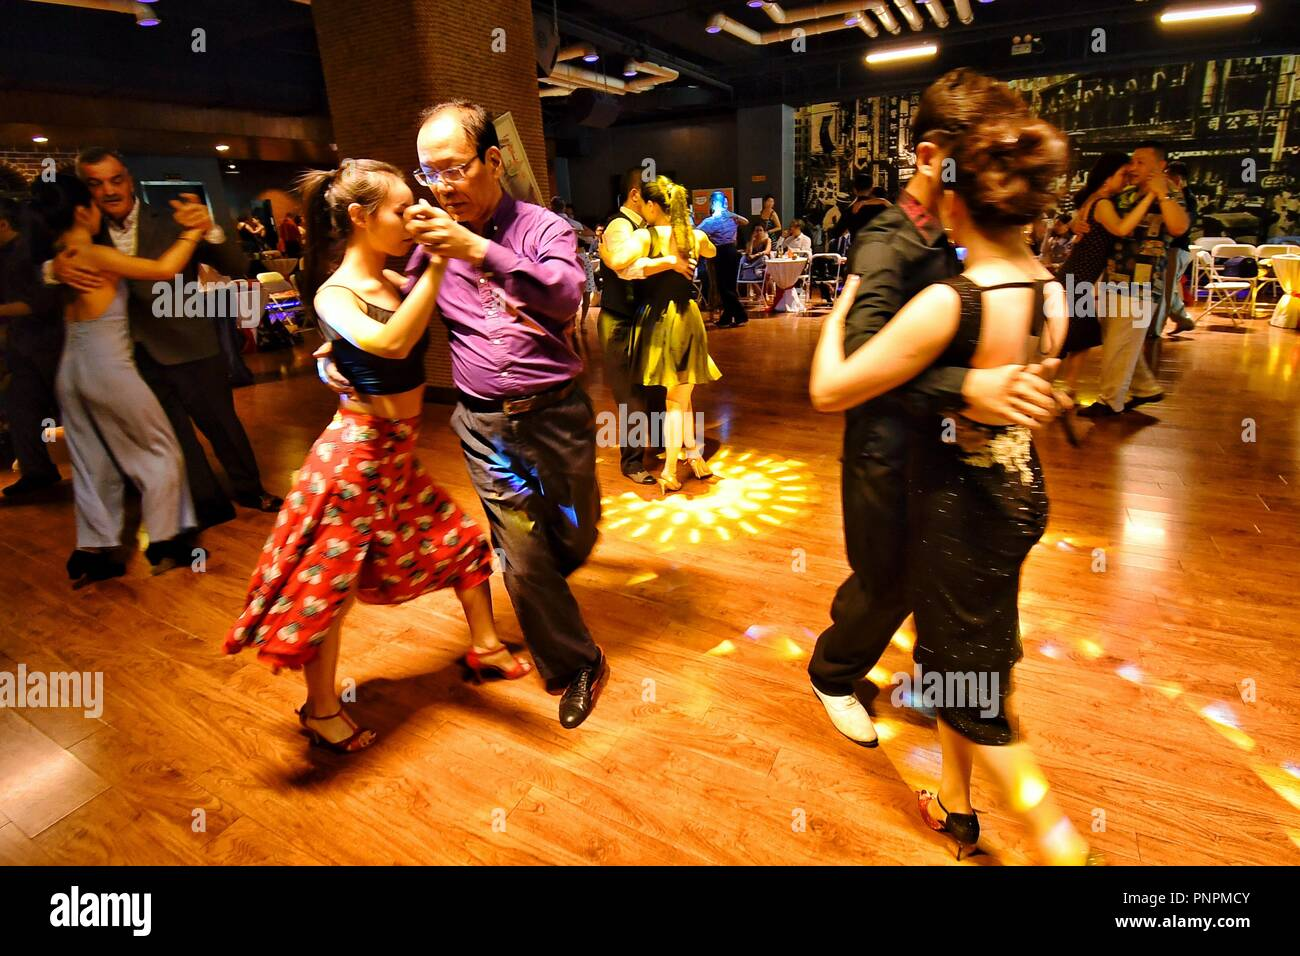 Marathon Dance Stock Photos Images Alamy Argentine Tango Steps Diagram Figures People At The Third